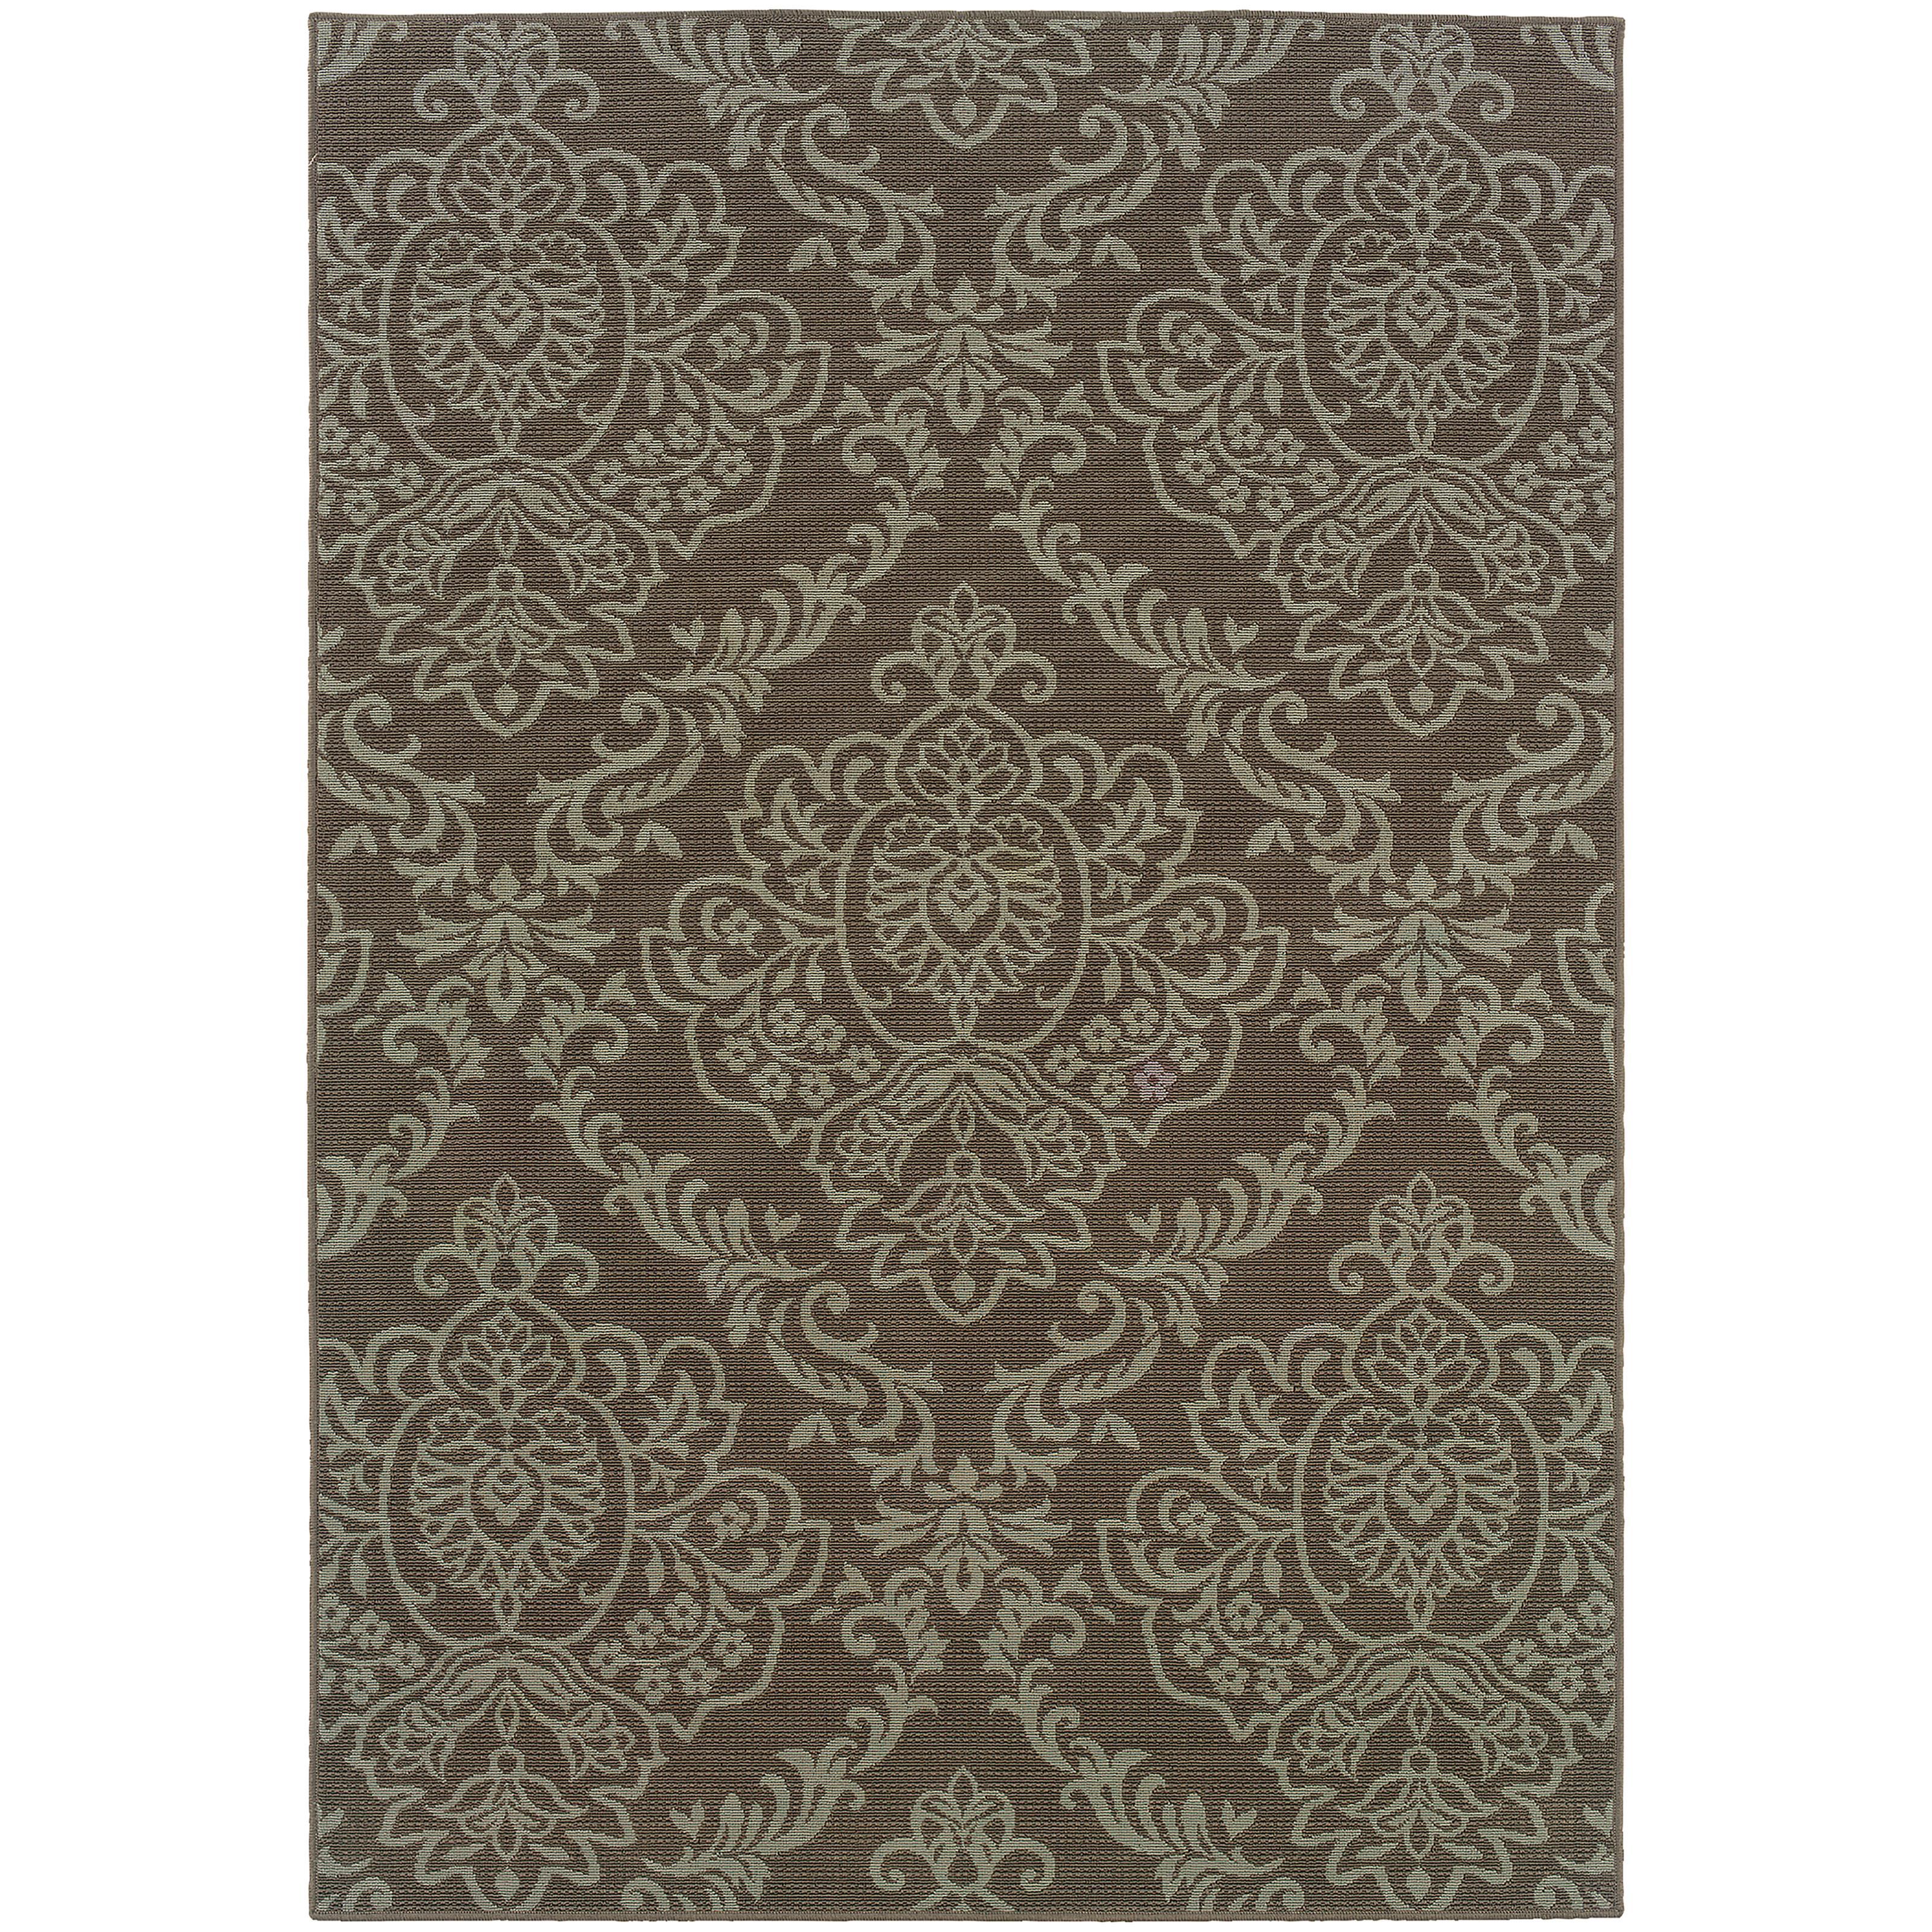 "Bali 3' 7"" X  5' 6"" Rug by Oriental Weavers at Steger's Furniture"